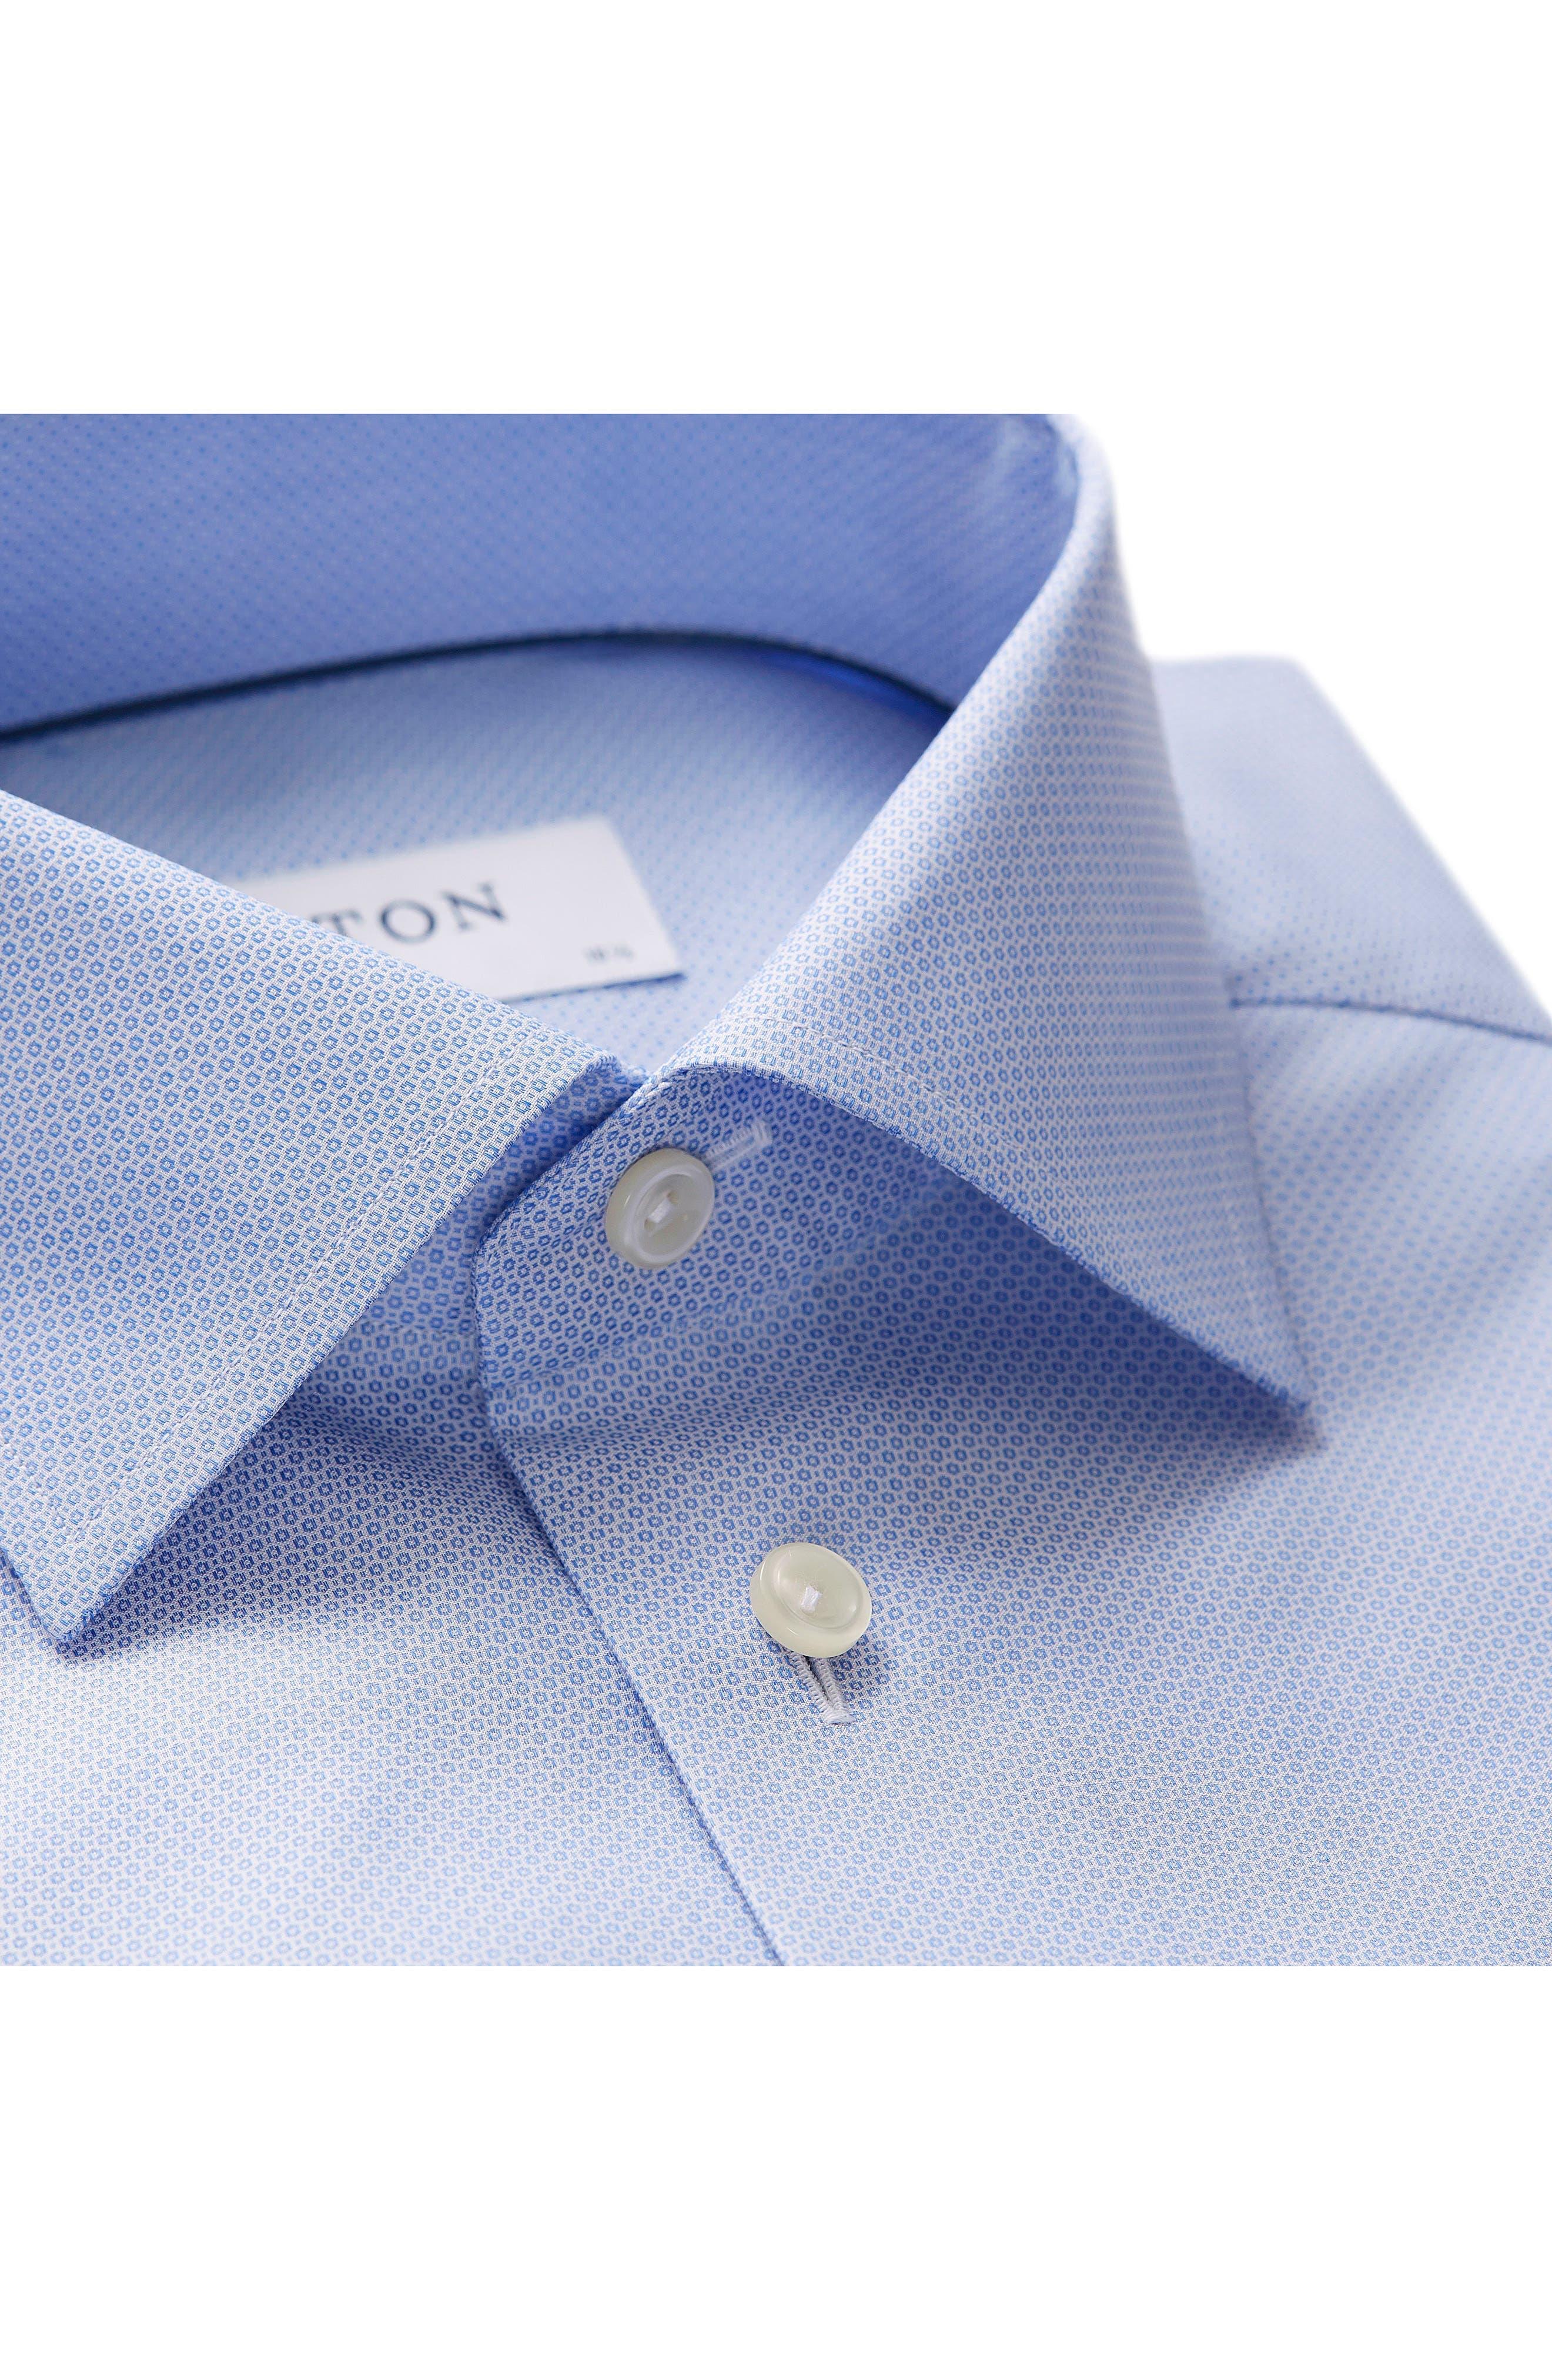 Slim Fit Solid Dress Shirt,                             Alternate thumbnail 3, color,                             400